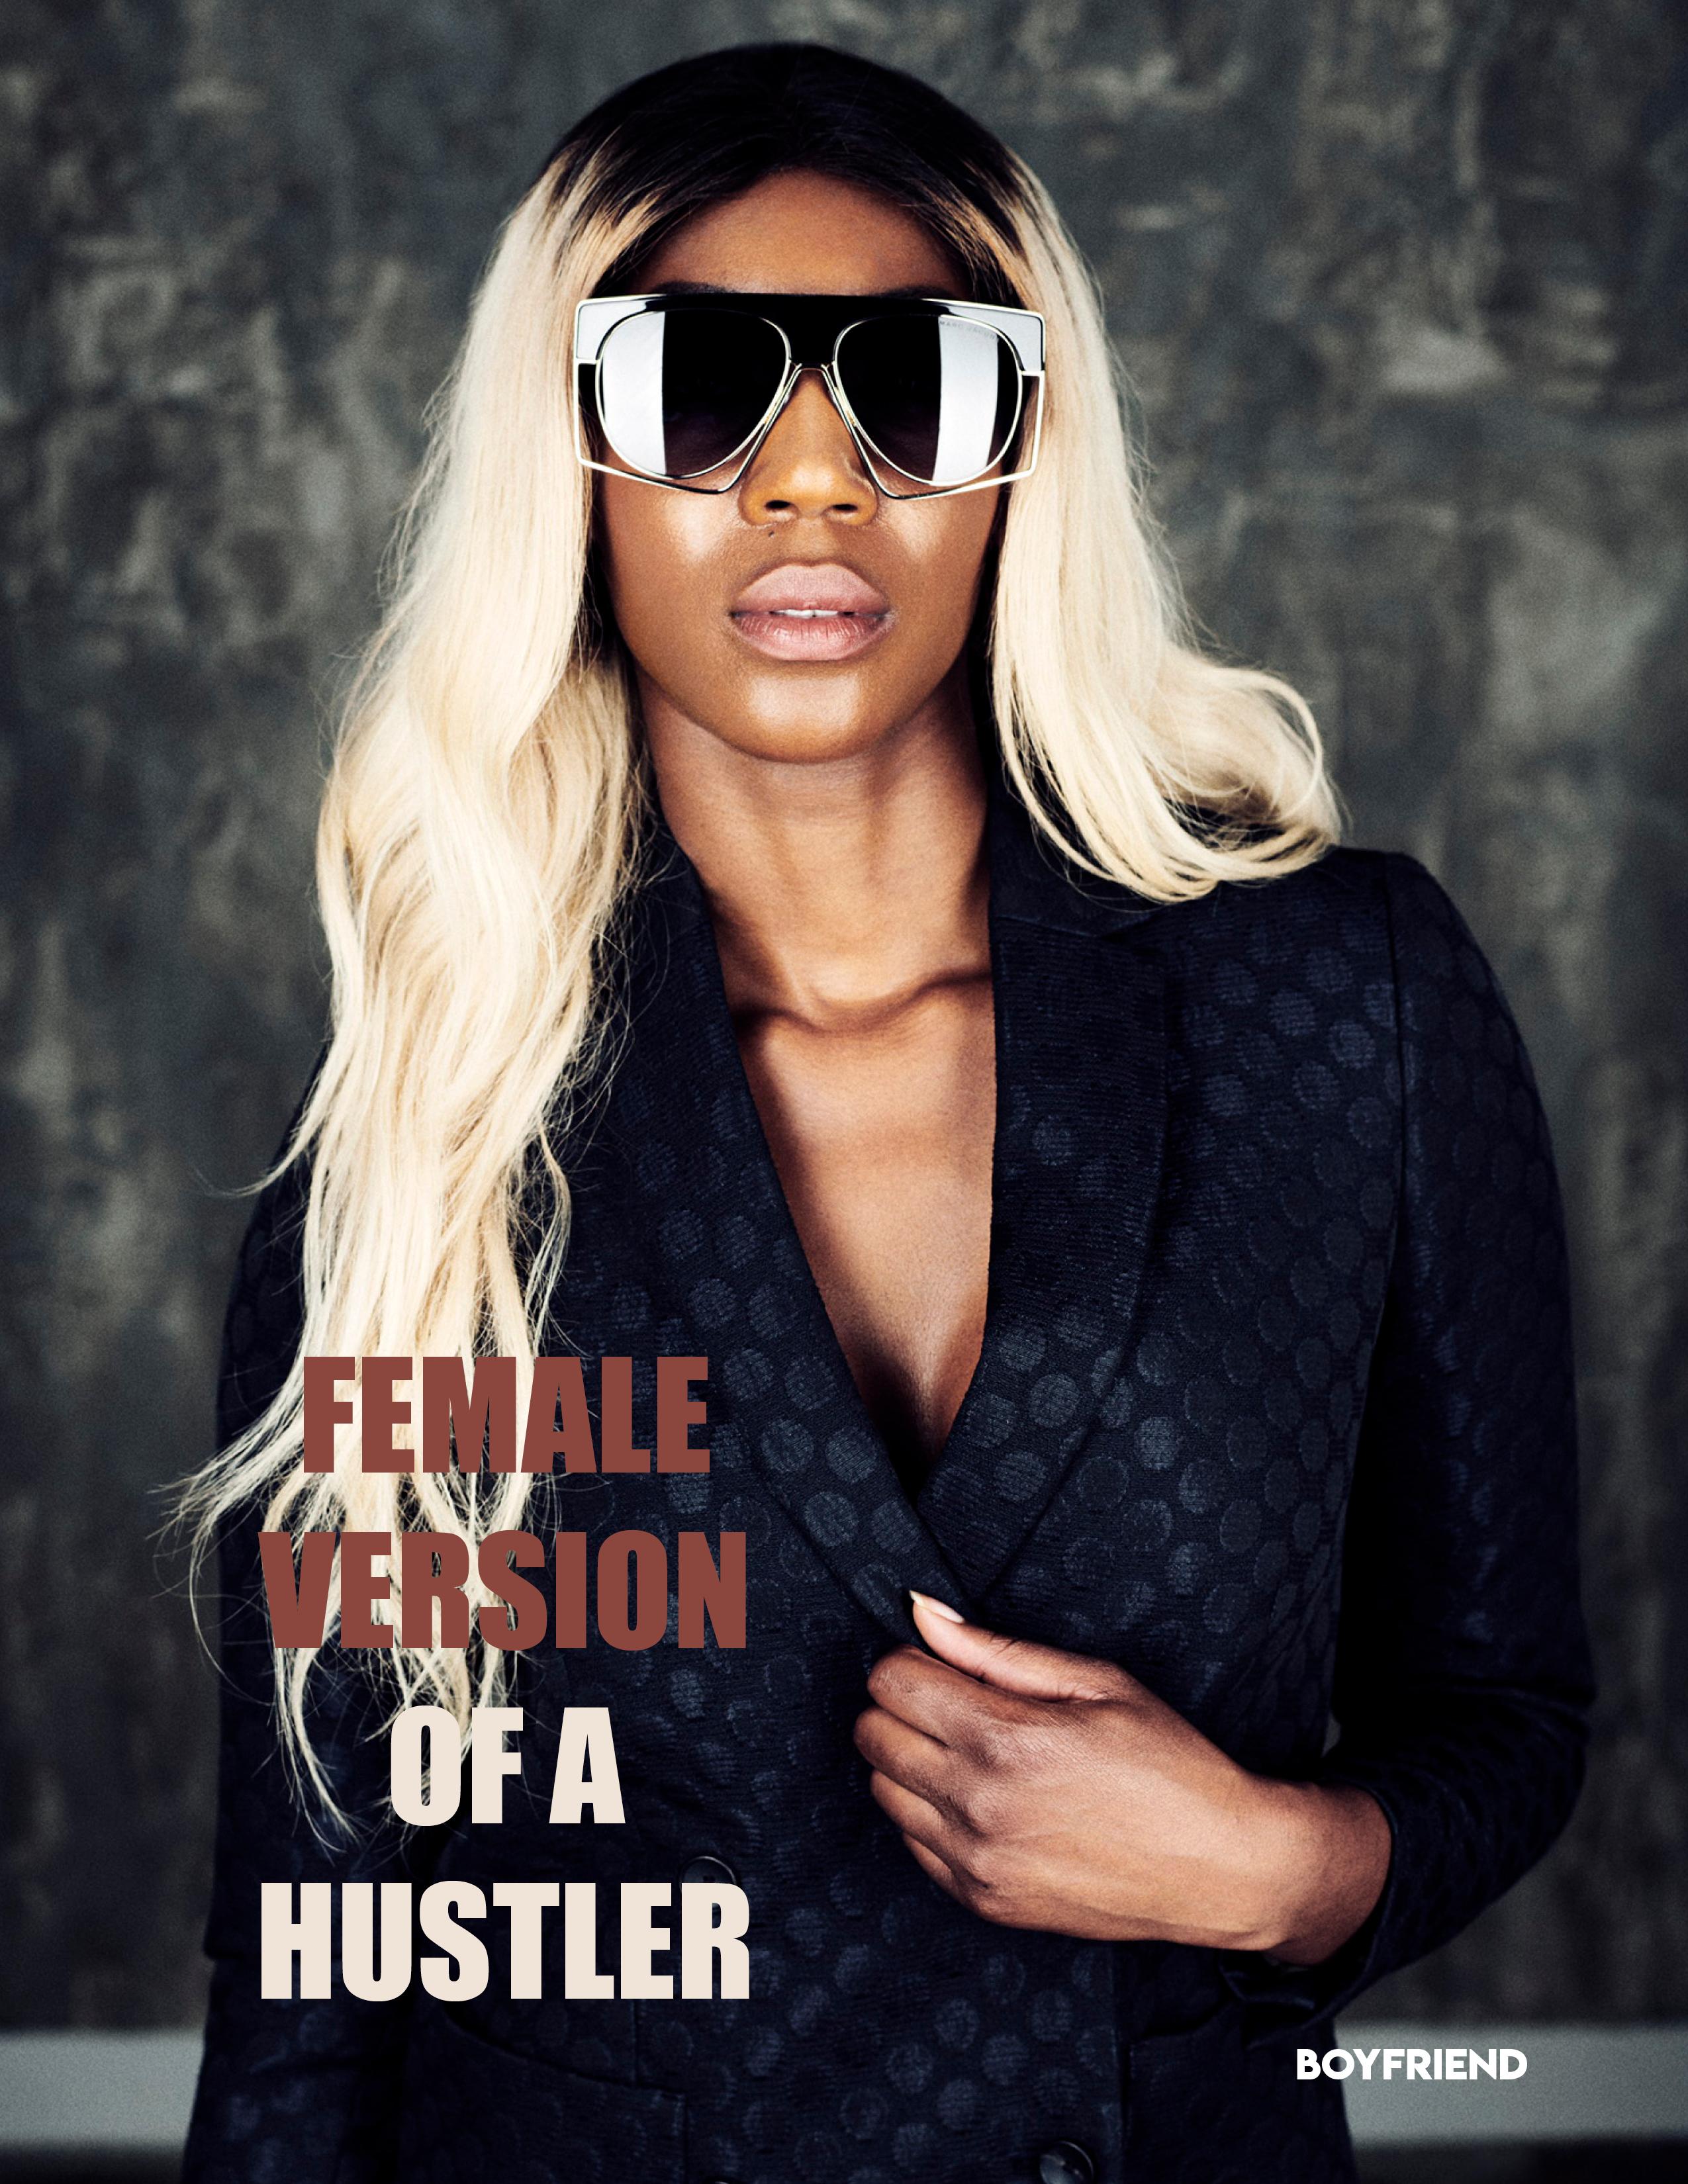 Female version of a hustler